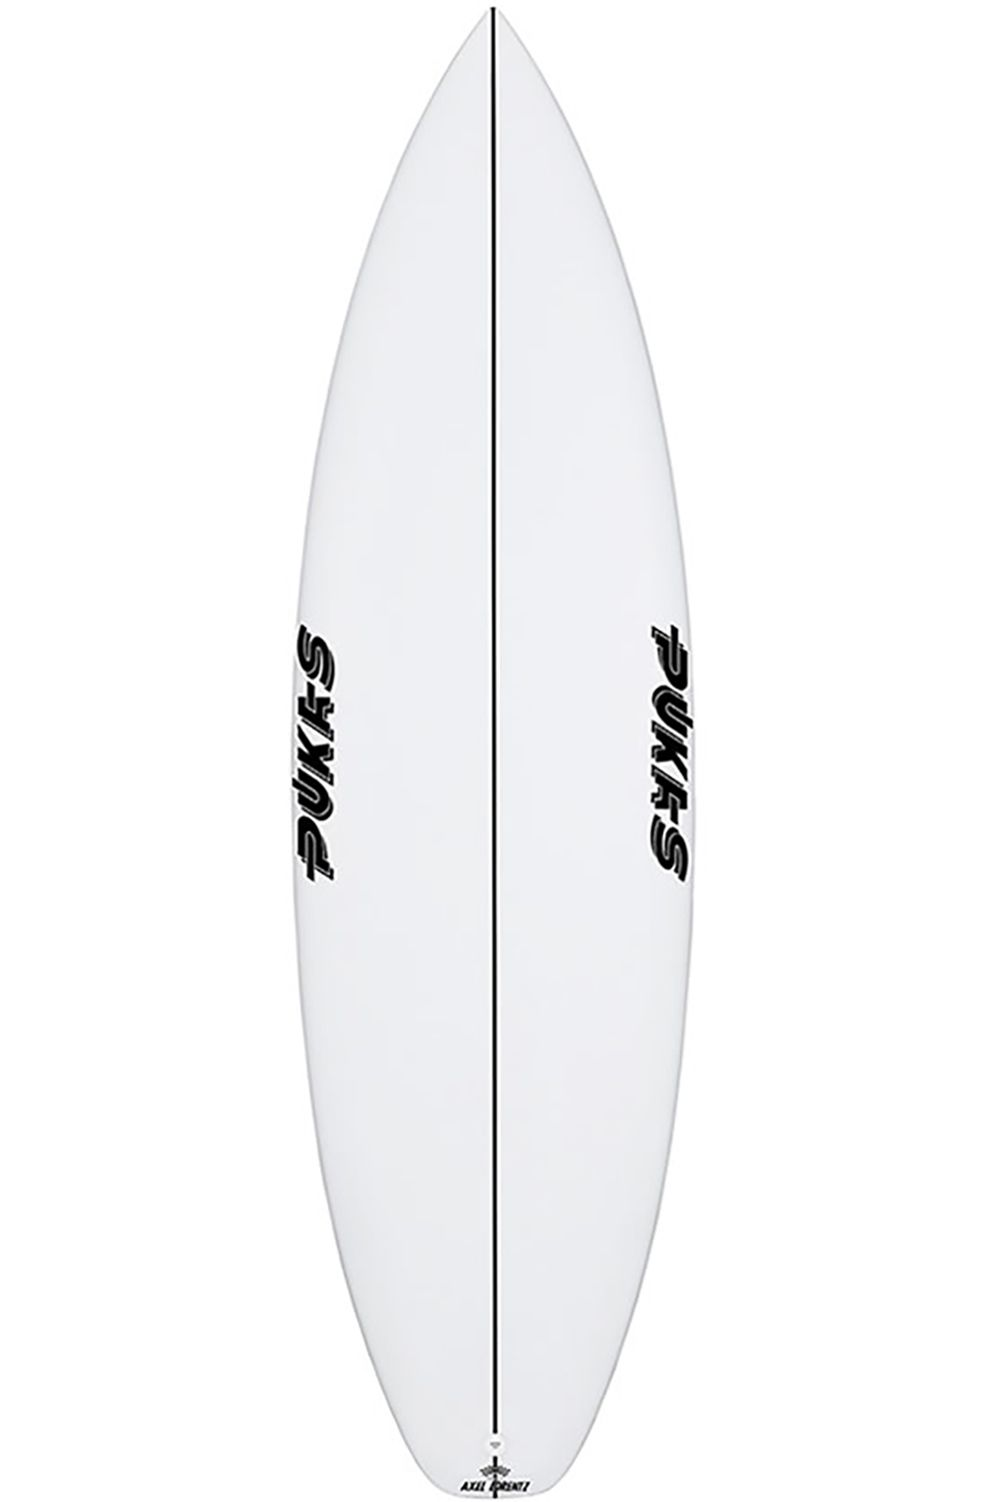 Pukas Surf Board 5'8 TASTY TREAT Squash Tail - White FCS II 5ft8